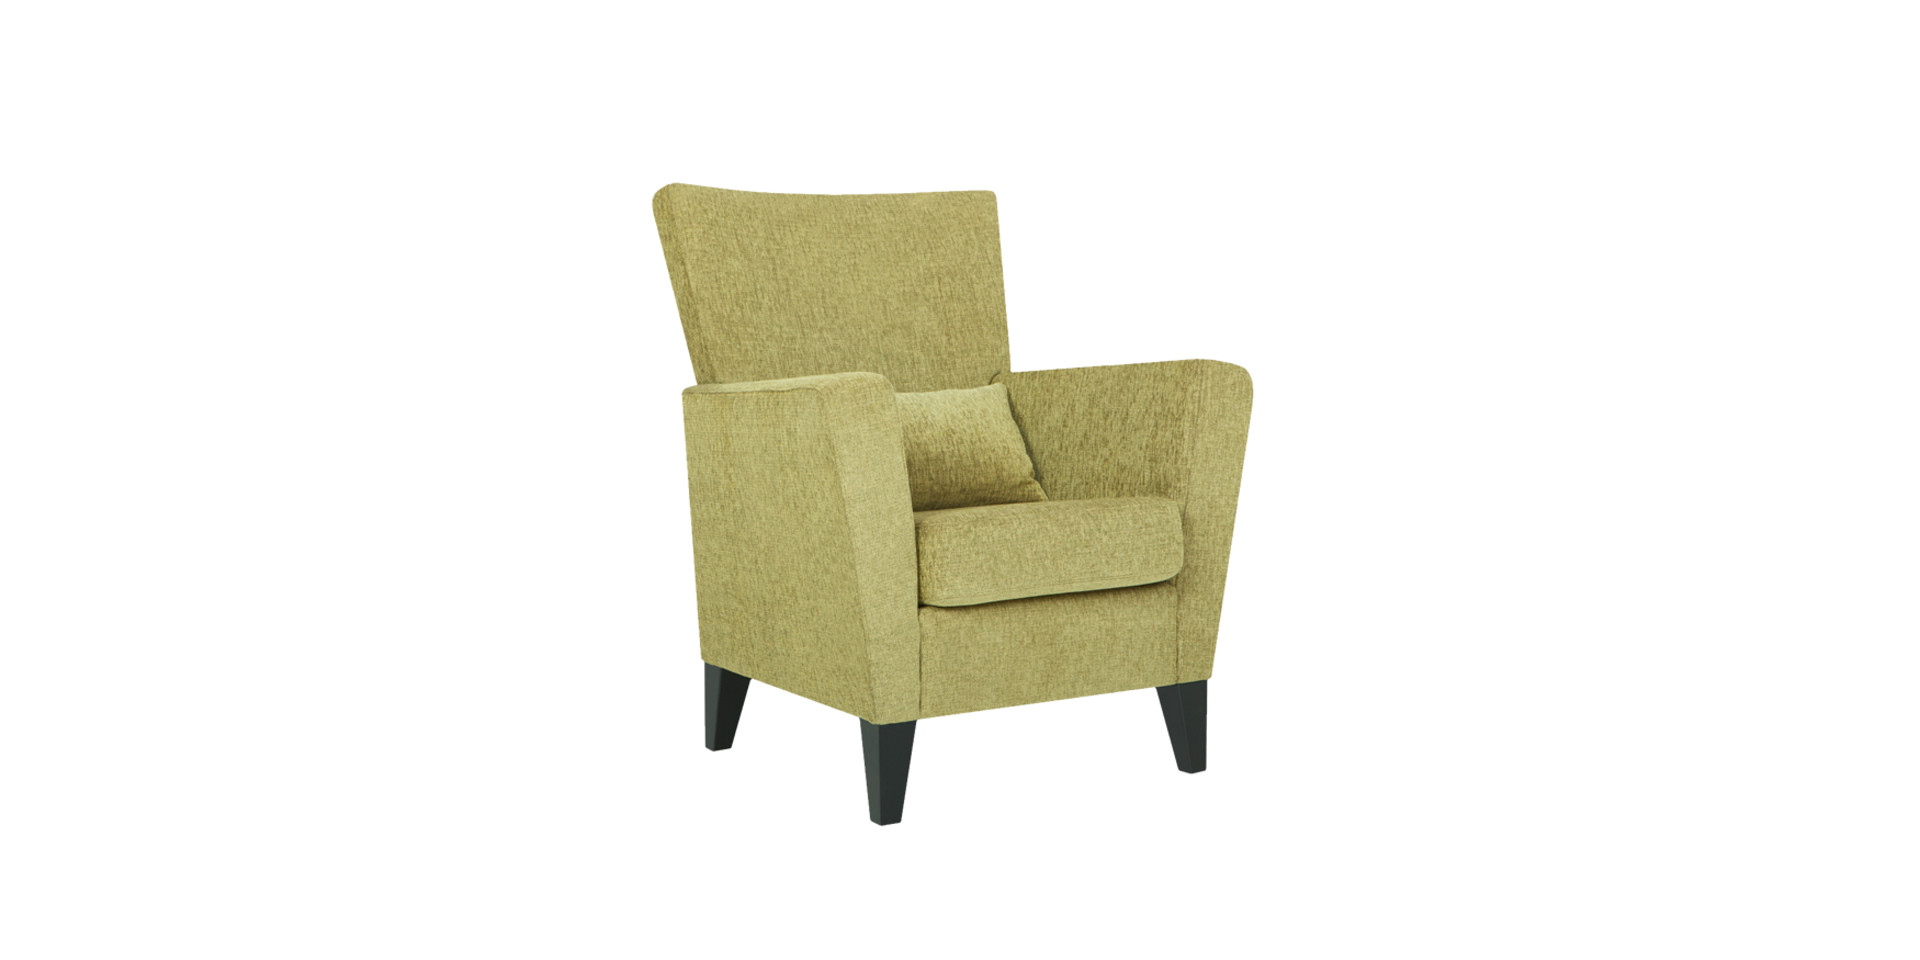 sits-denver-fauteuil-armchair_divine36_mustard_2